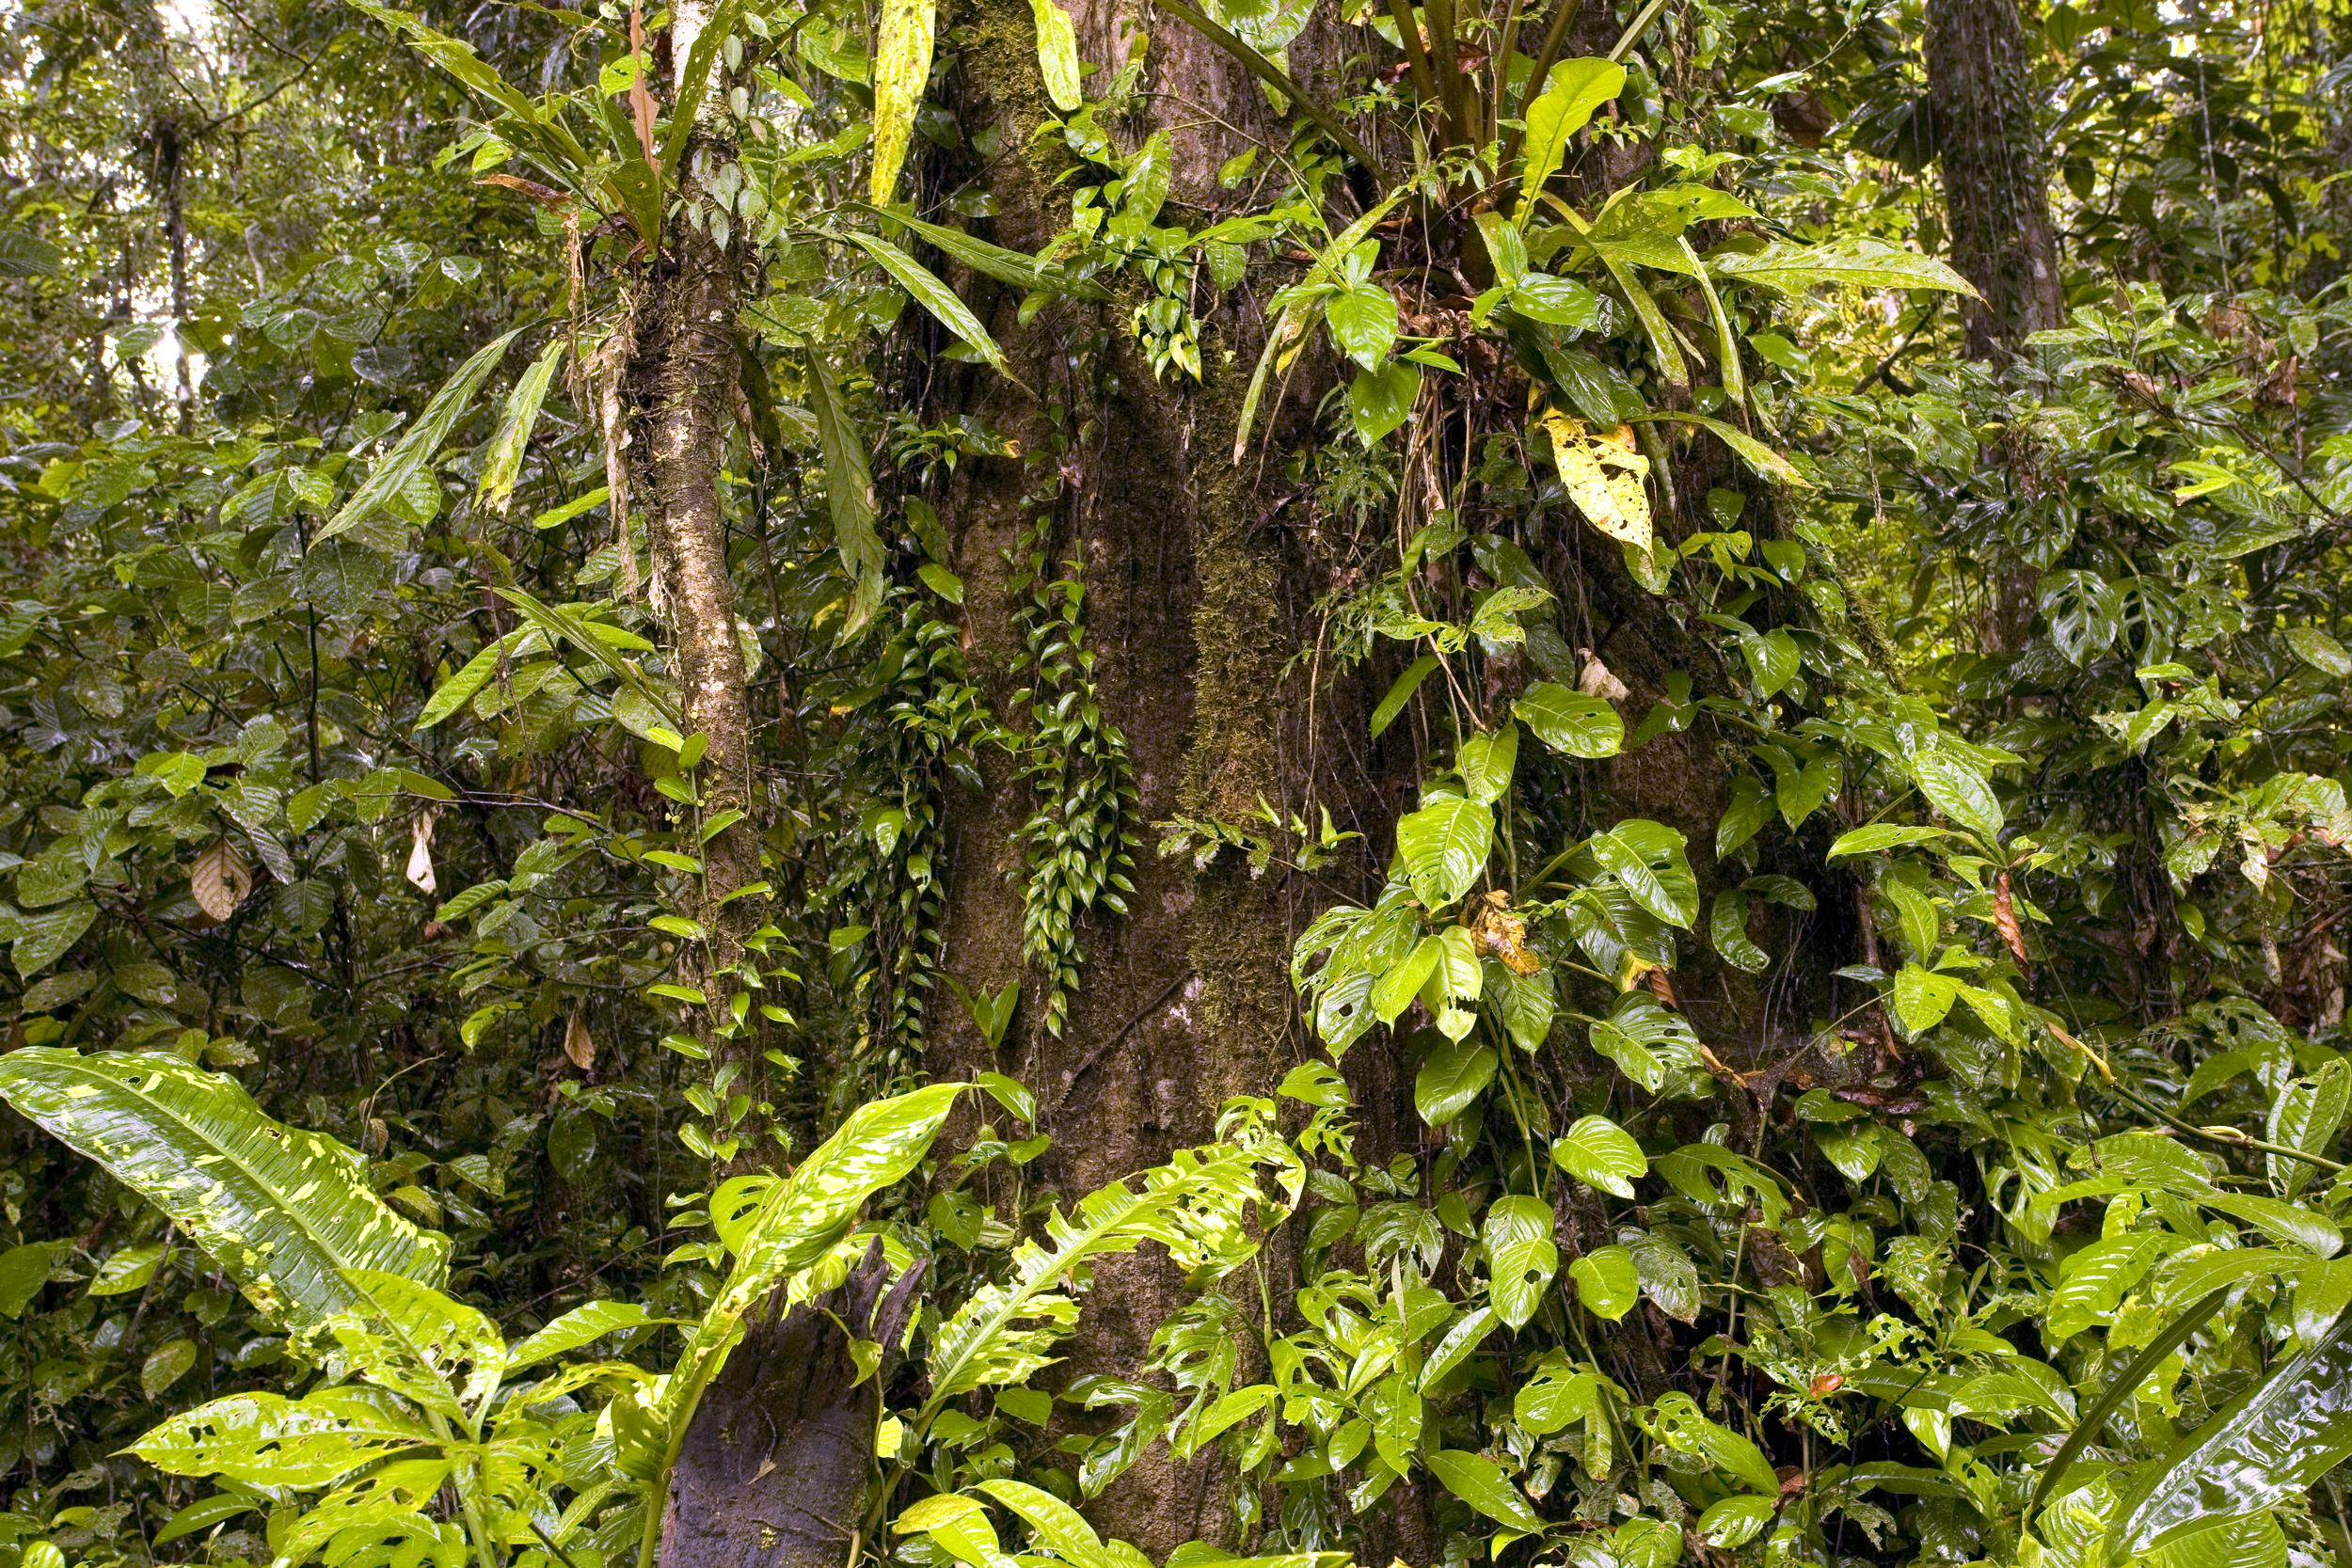 Interior of tropical rainforest in Ecuador shutterstock_85039771.jpg